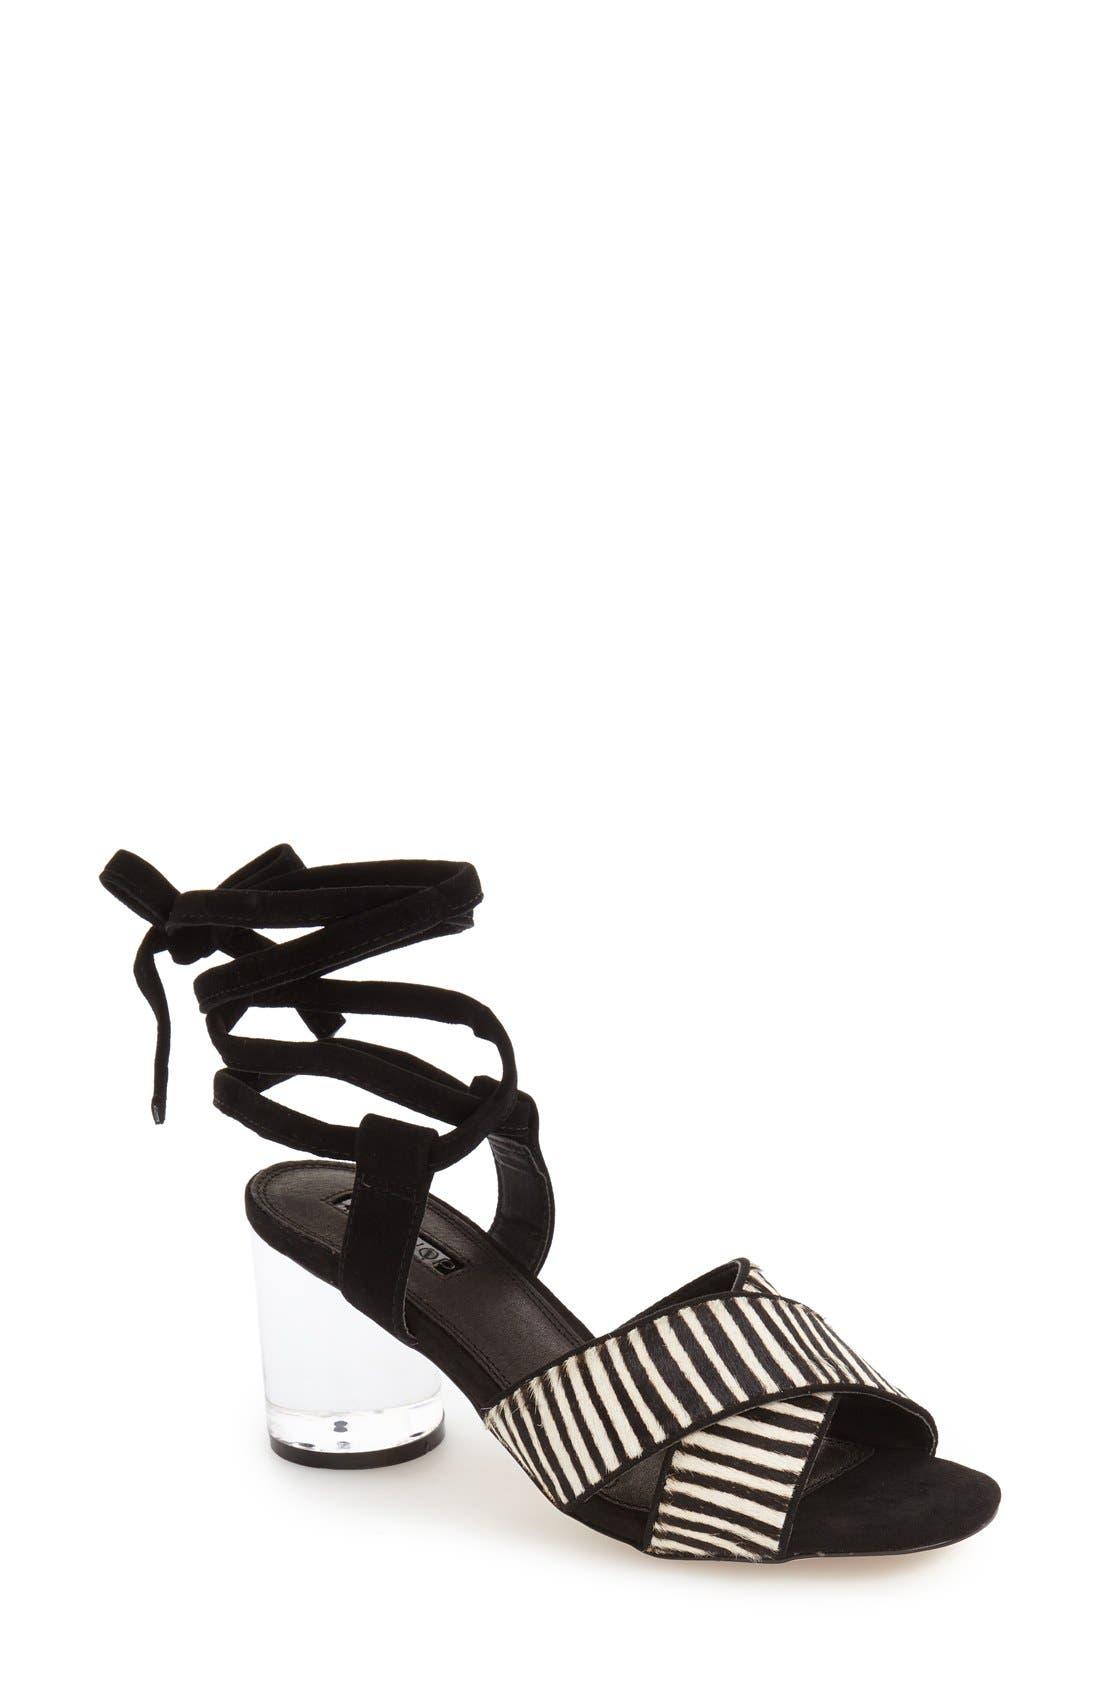 TOPSHOP 'Raffle' Ankle Strap Sandal, Main, color, 001